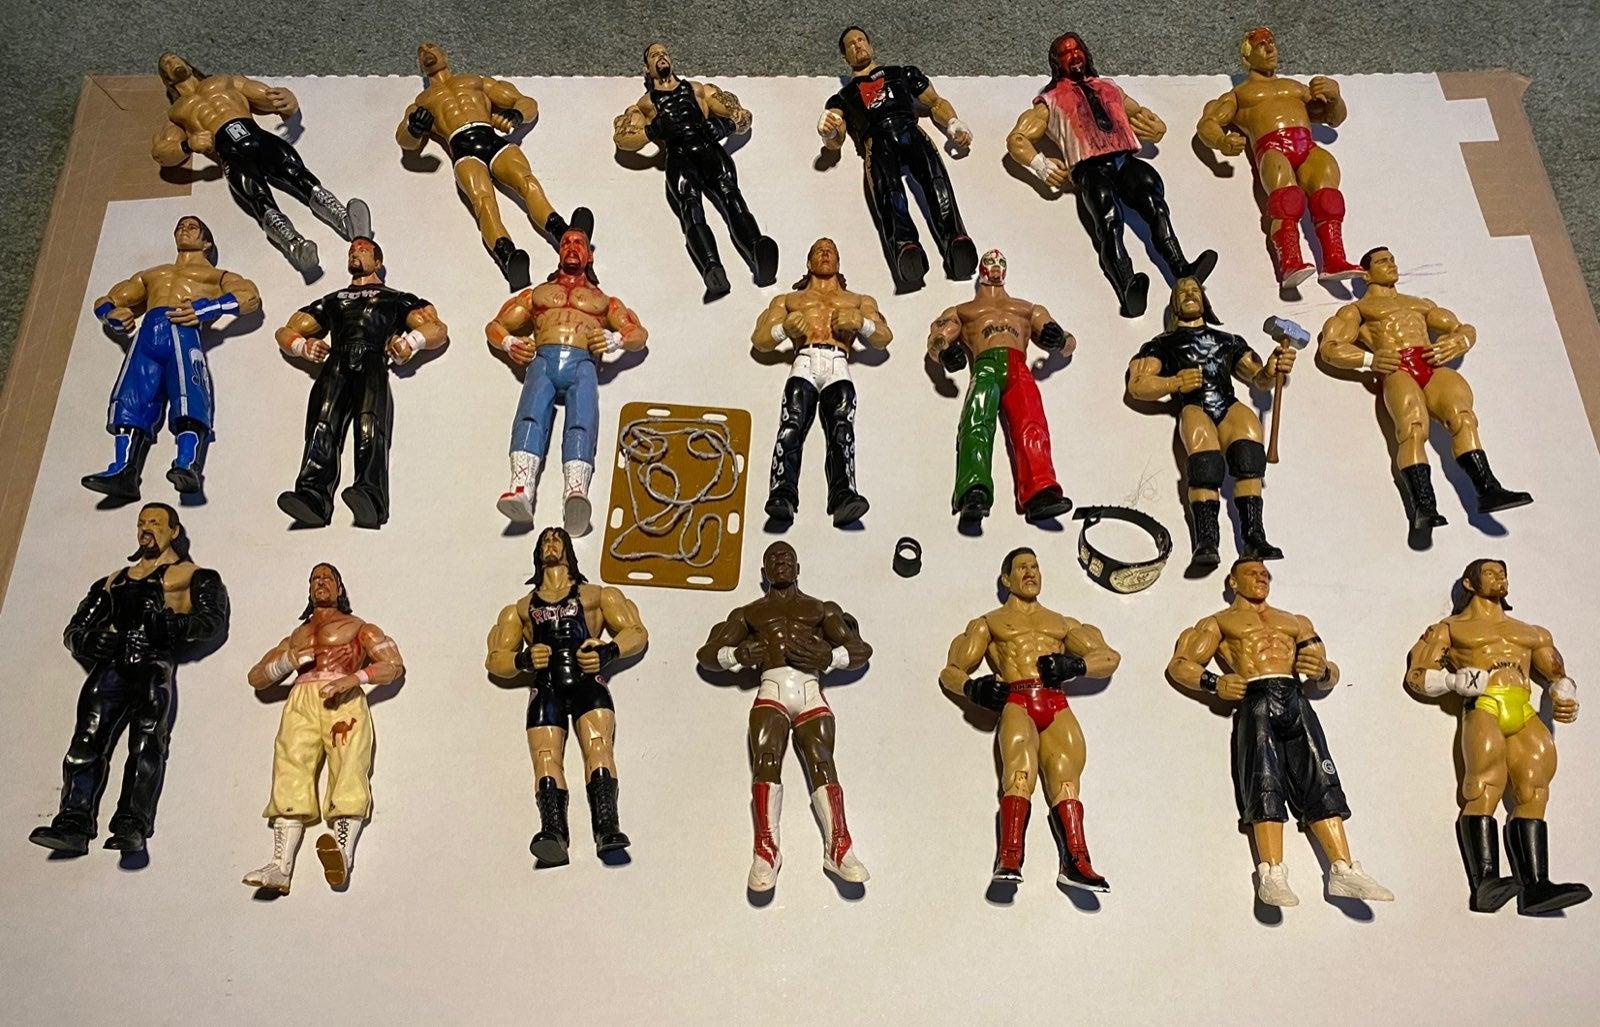 Reserved Goldberg Figure